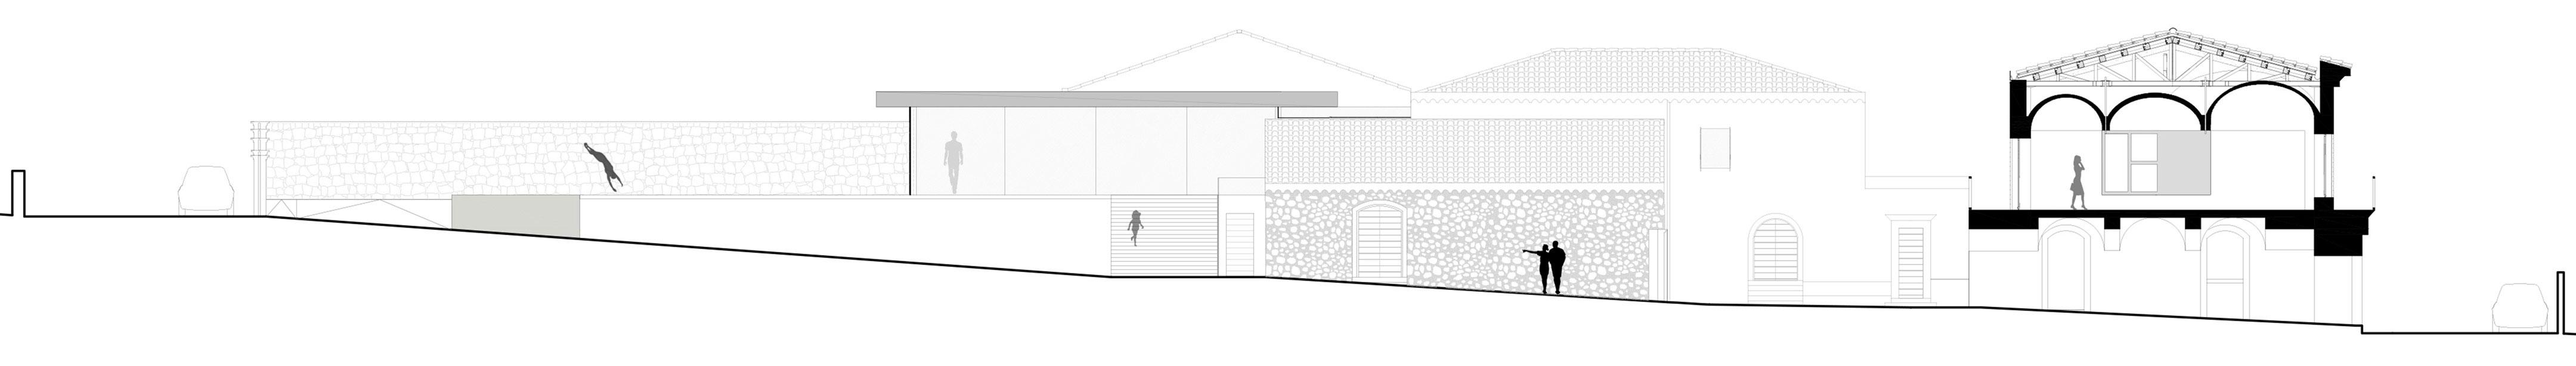 CRV House in Viagrande by ACA Amore Campione Architettura-31